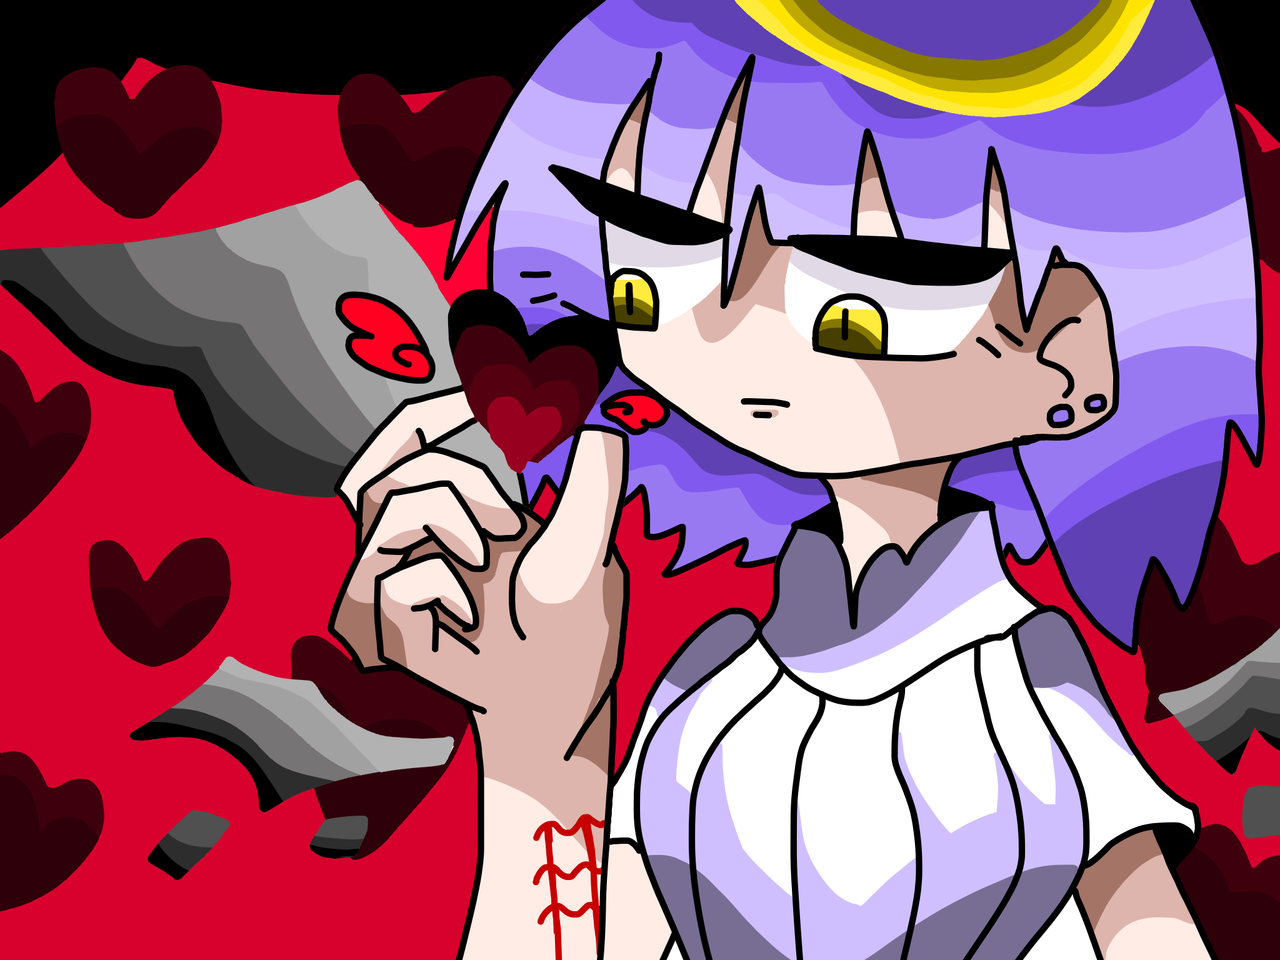 rkgk Illust of 🥩𝕋𝕚𝕦🥩 ハート angel medibangpaint original red